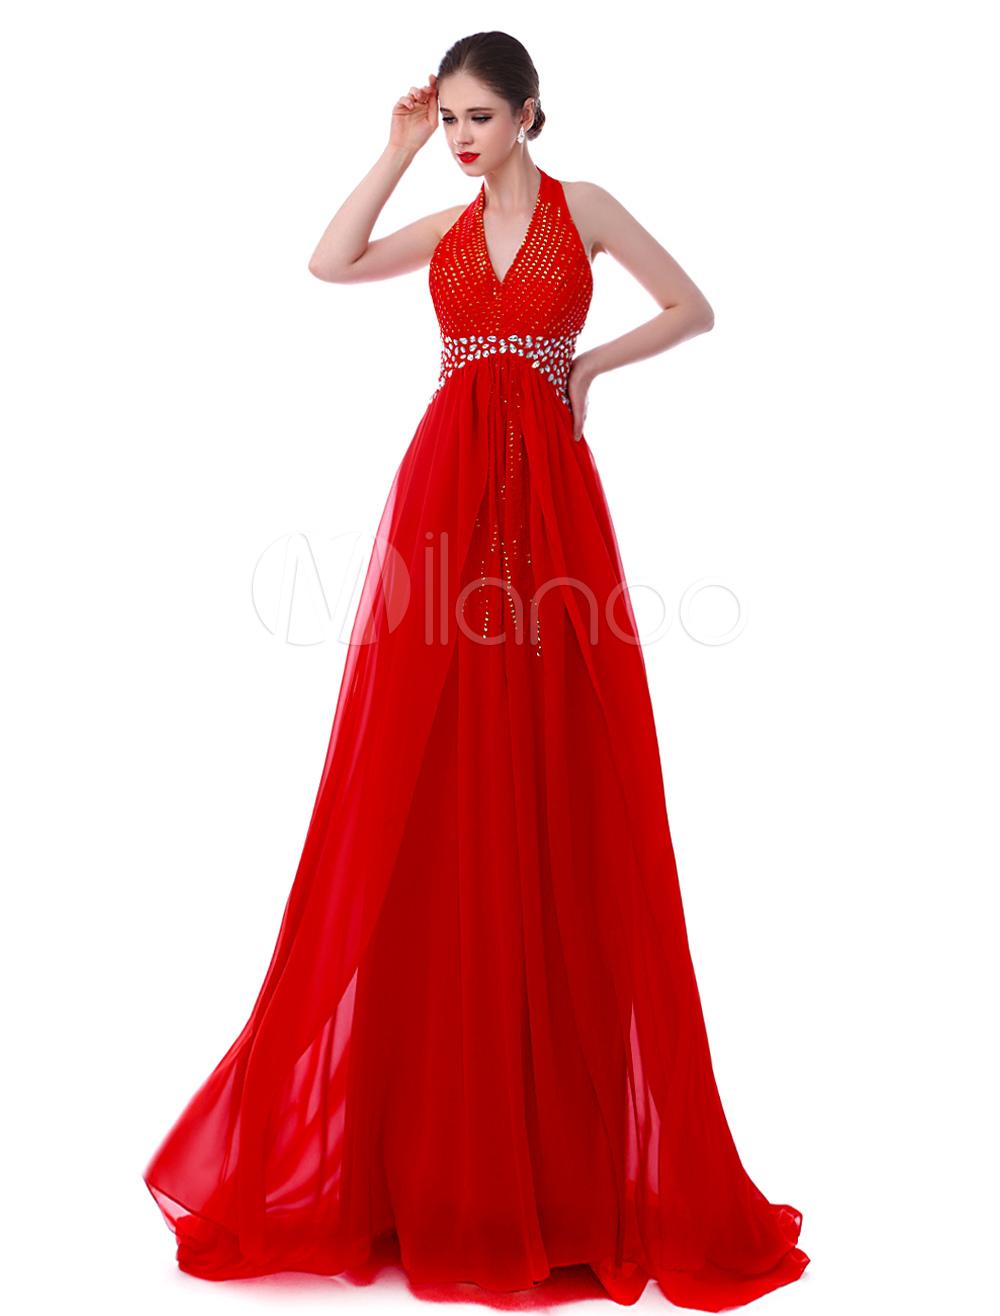 Gorgeous Red Chiffon Halter Sequin Evening Dress (Wedding Evening Dresses) photo